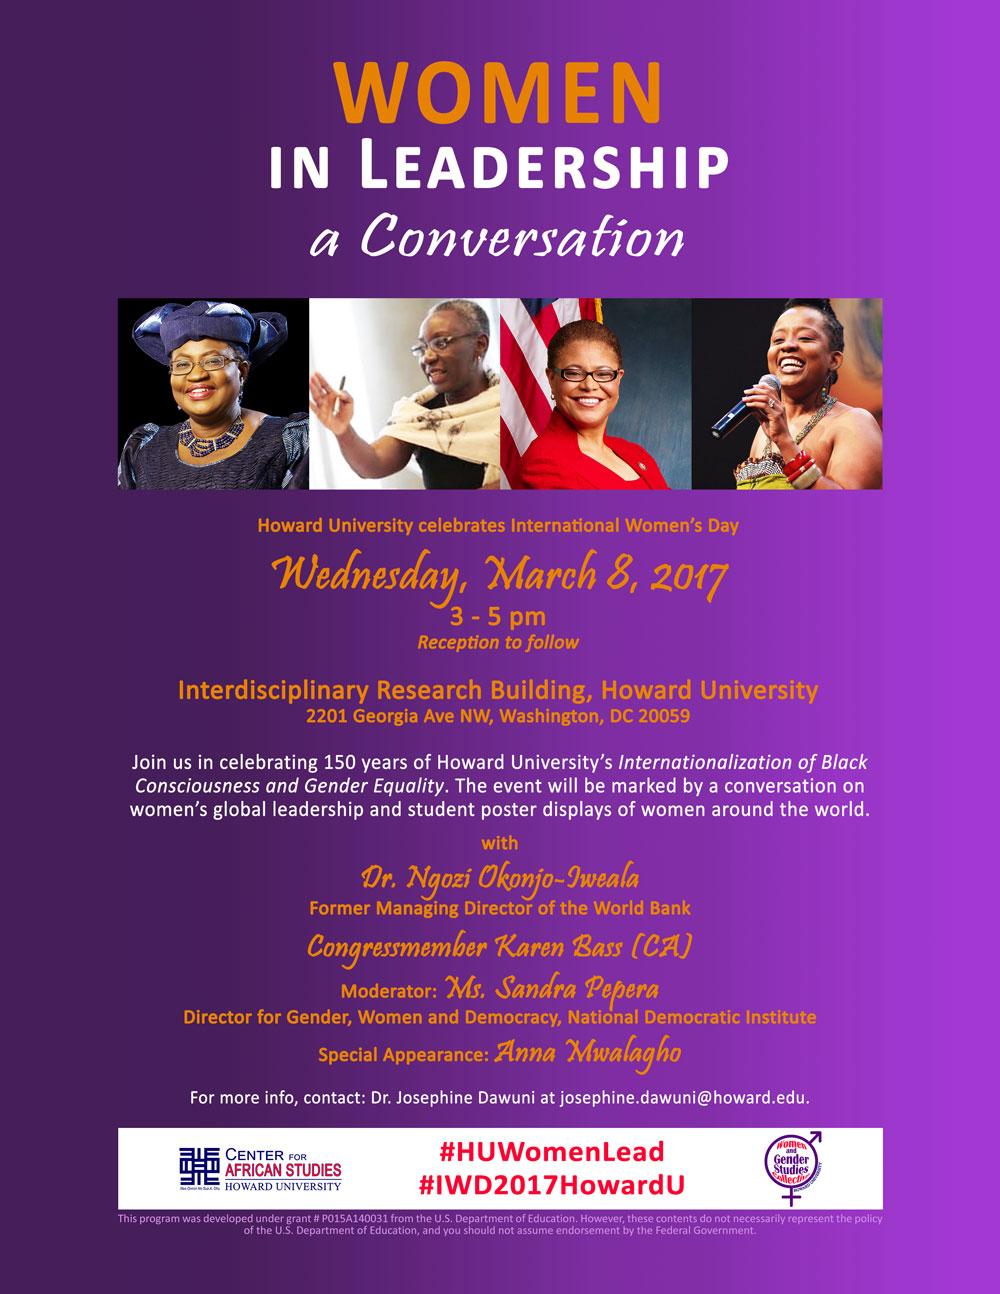 Women in Leadership: a Conversation